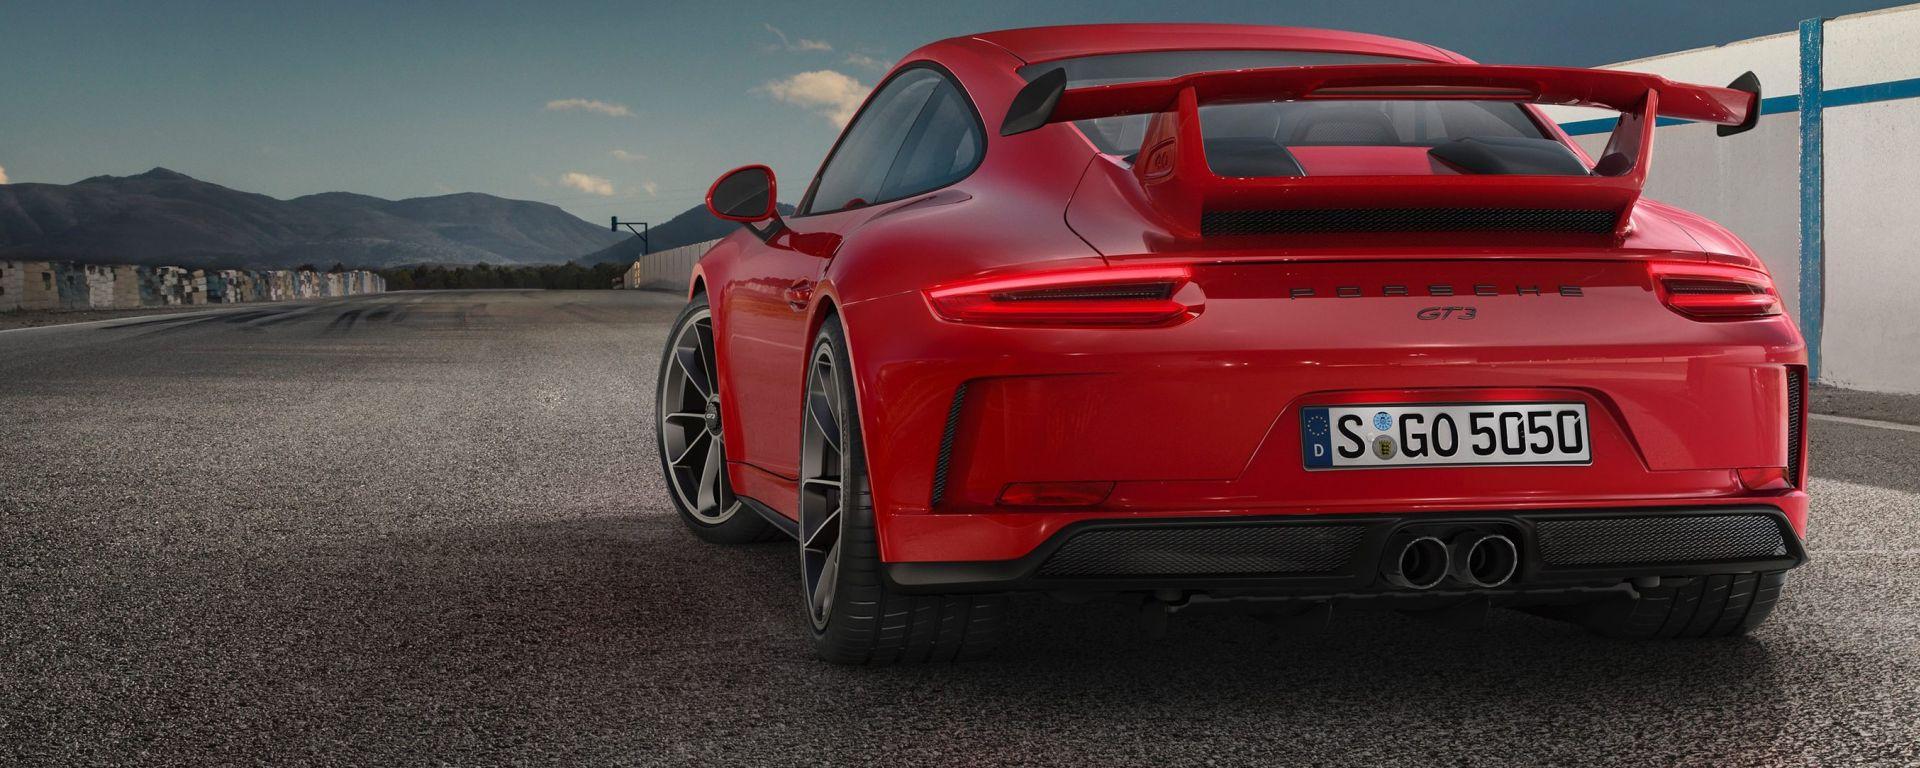 Porsche 911 GT3 2017, alettone posteriore